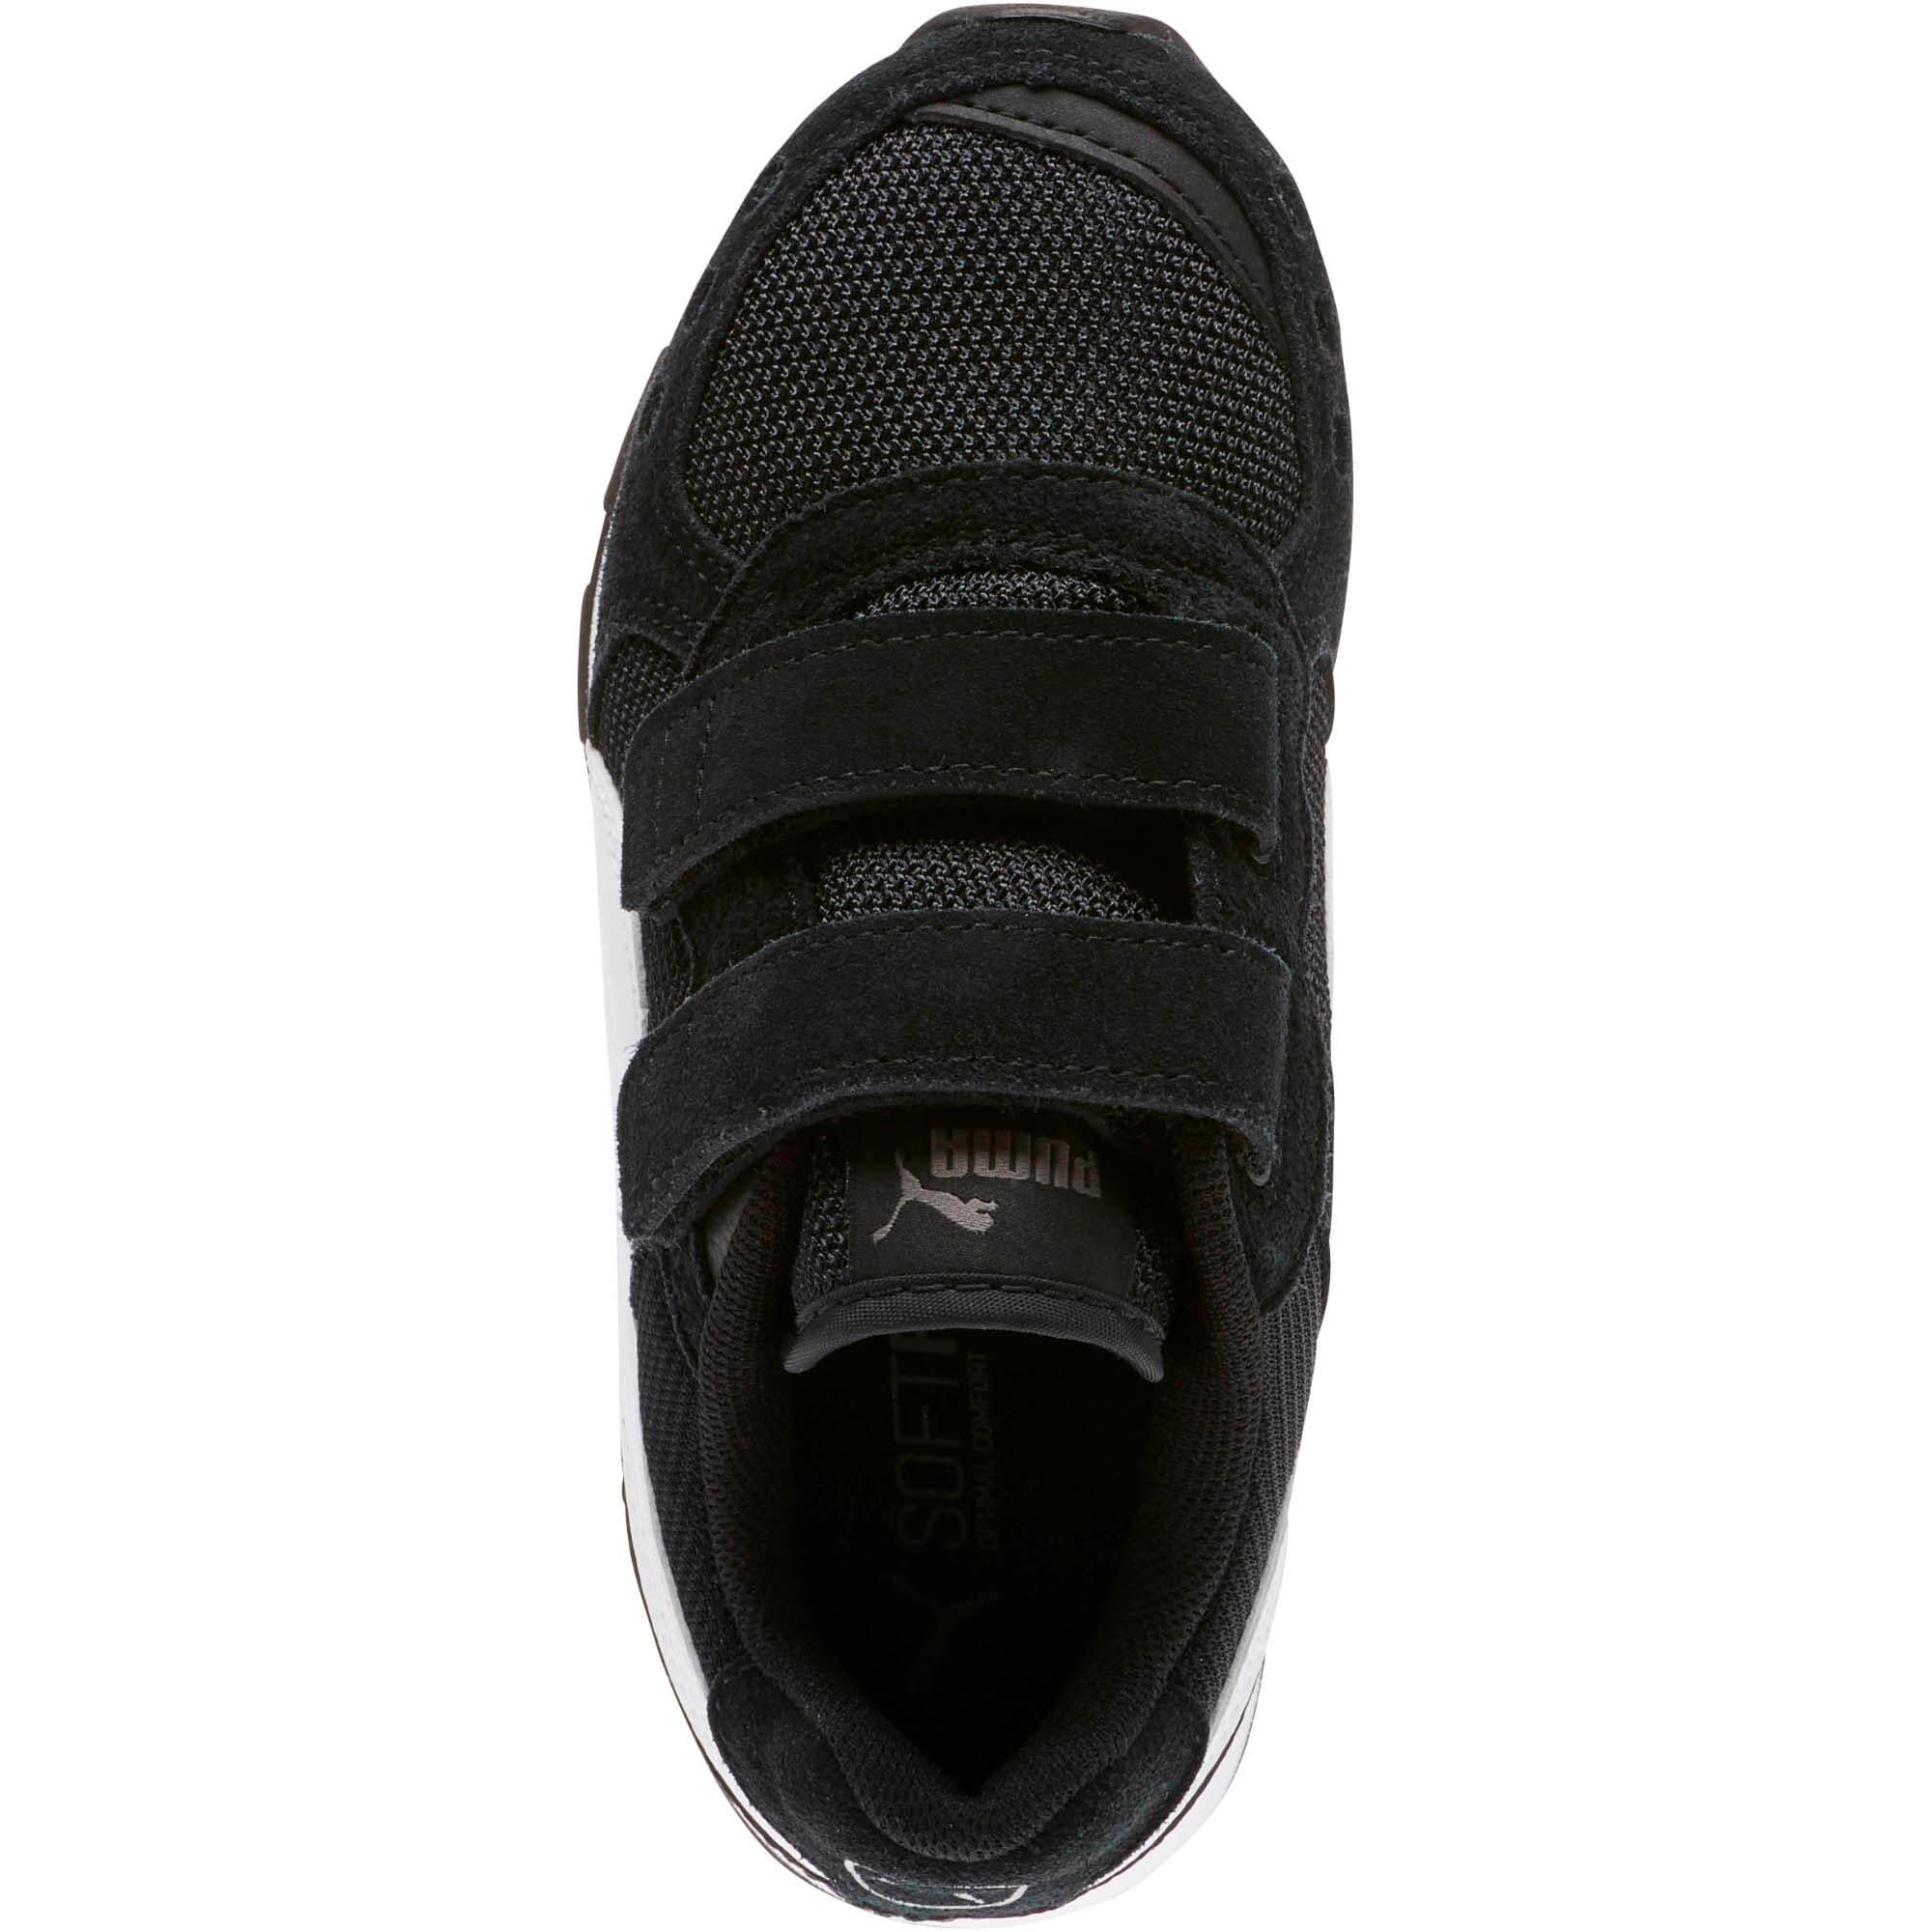 Thumbnail 5 of Vista Little Kids' Shoes, Puma Black-Puma White, medium